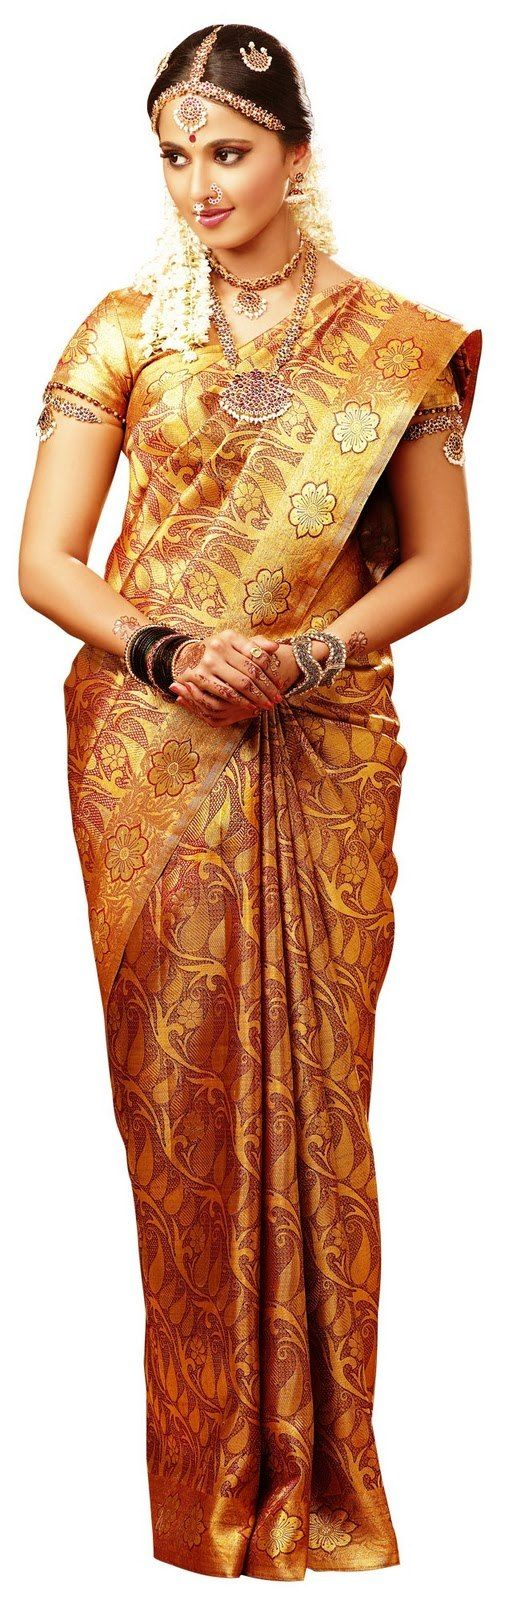 Cute Anushka Shetty in sweet designer saree